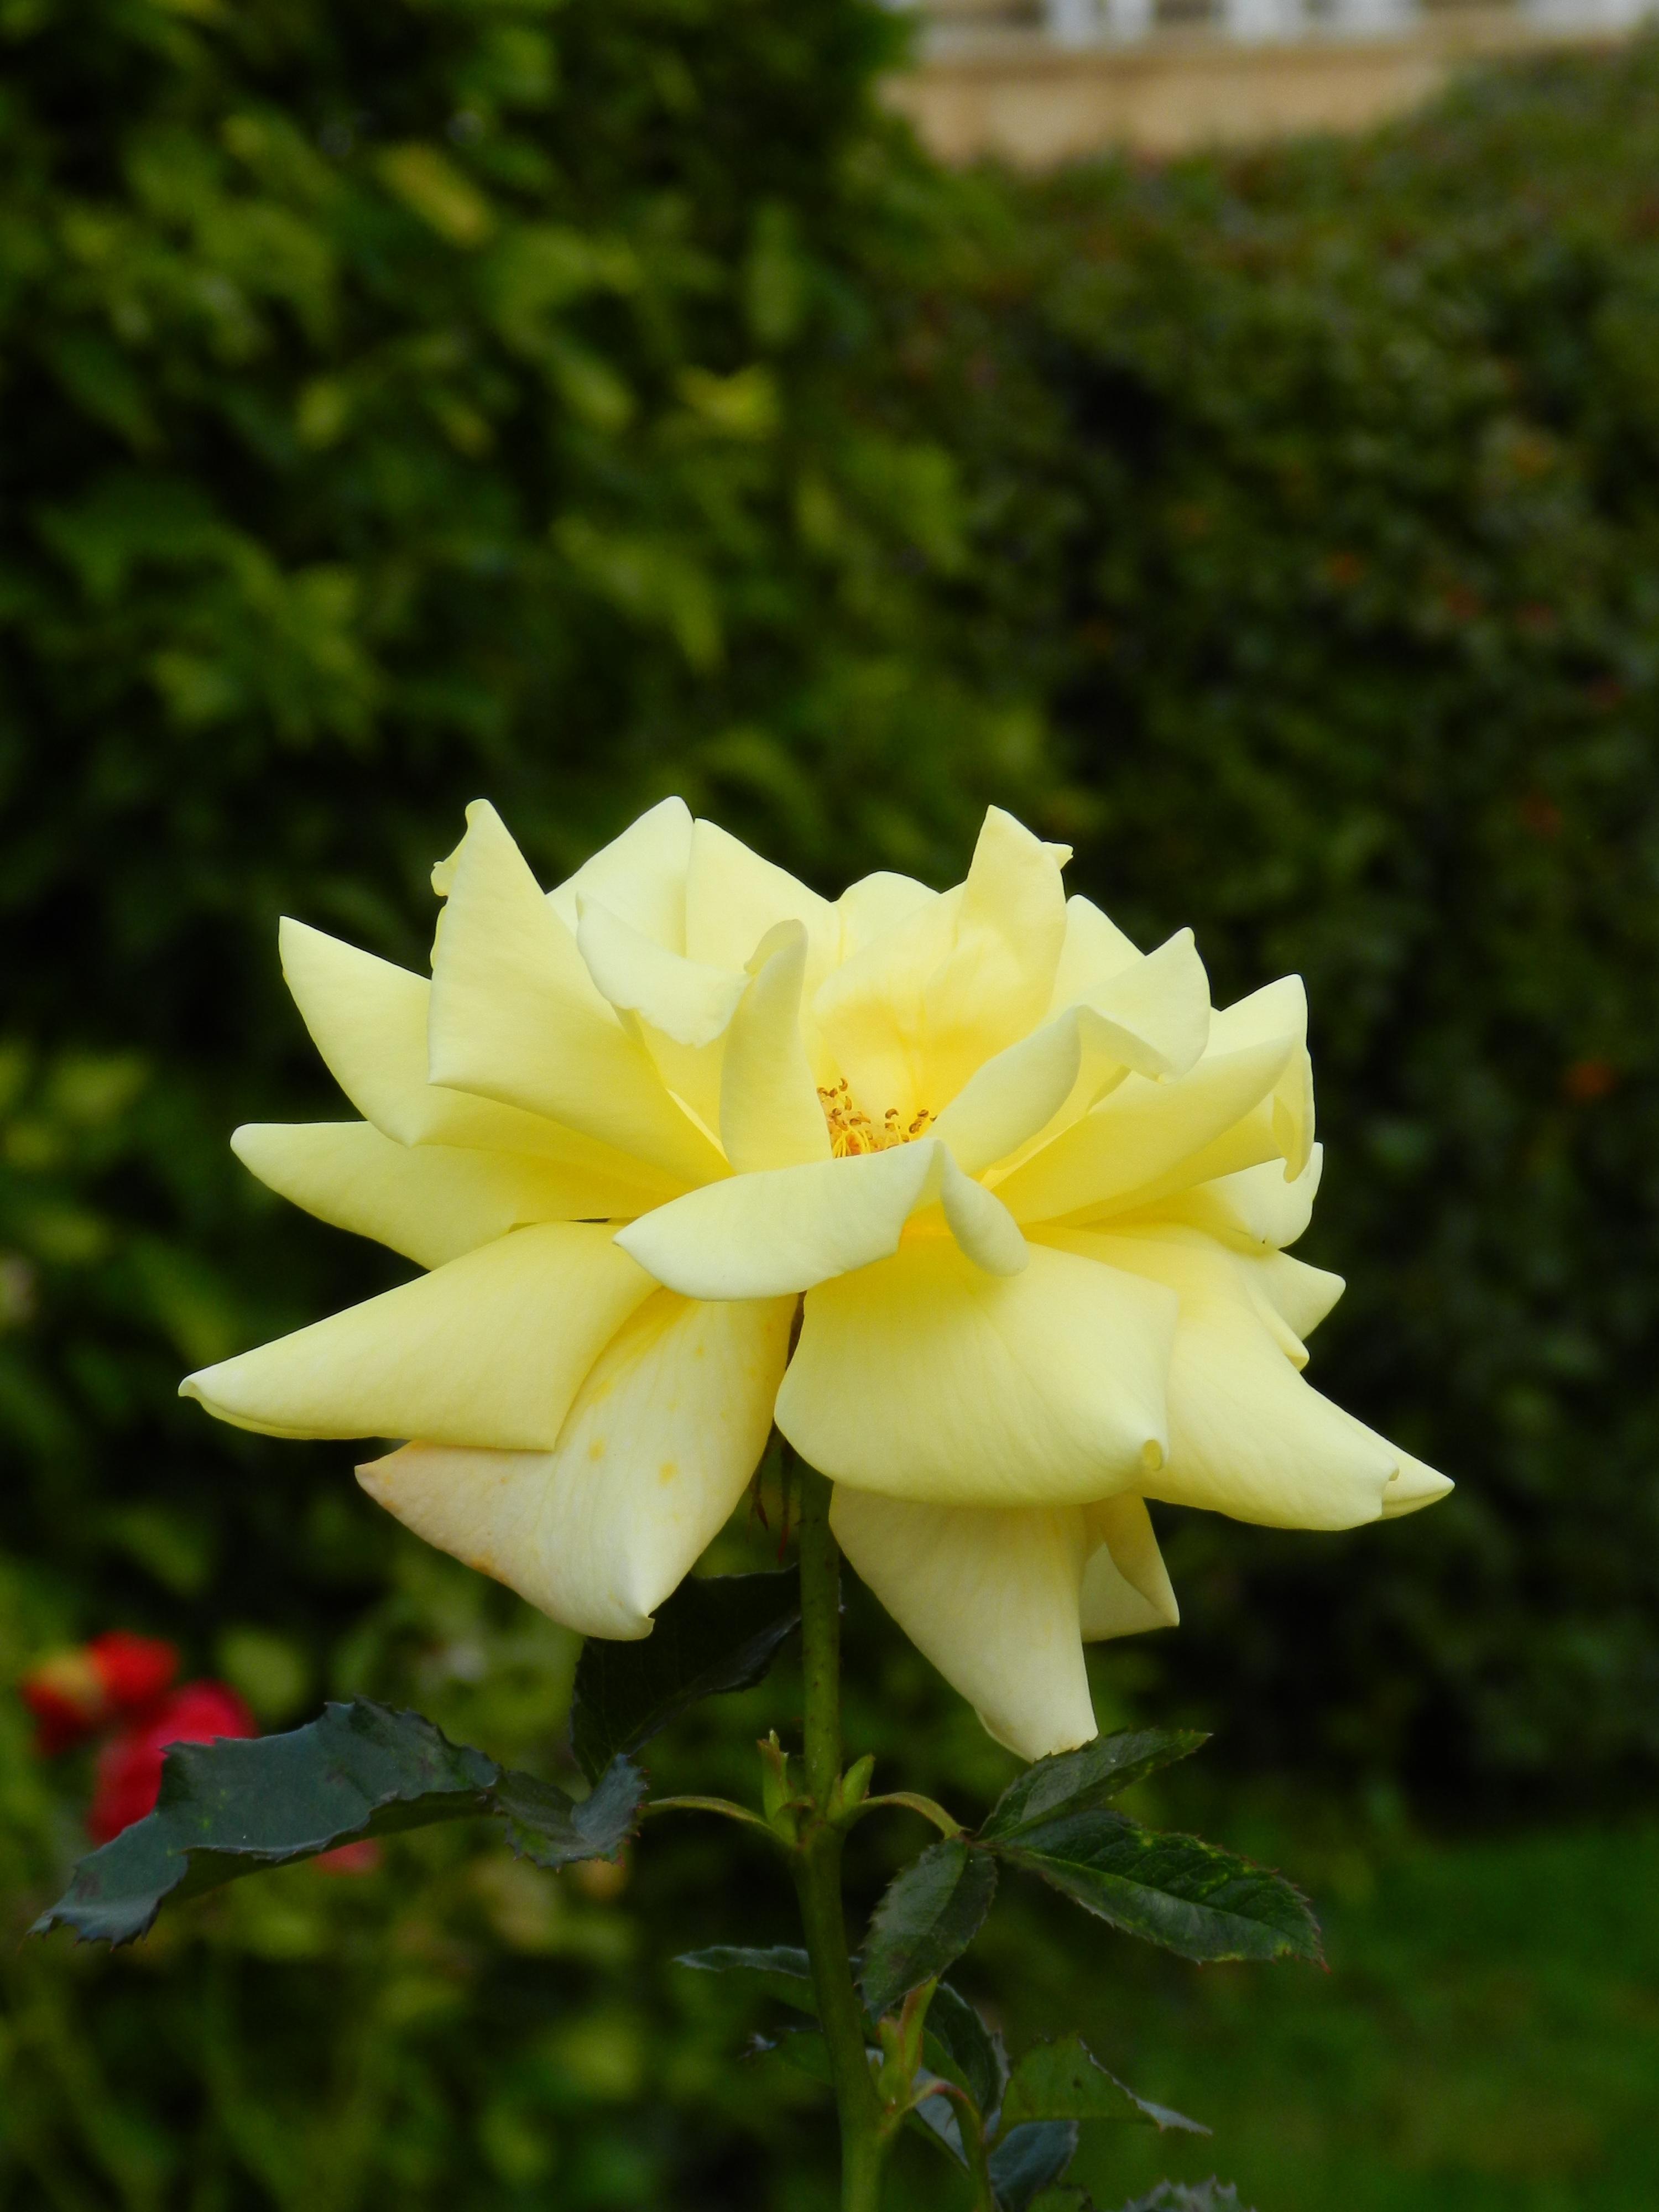 Free Images Flower Petal Macro Botany Flora Shrub Yellow